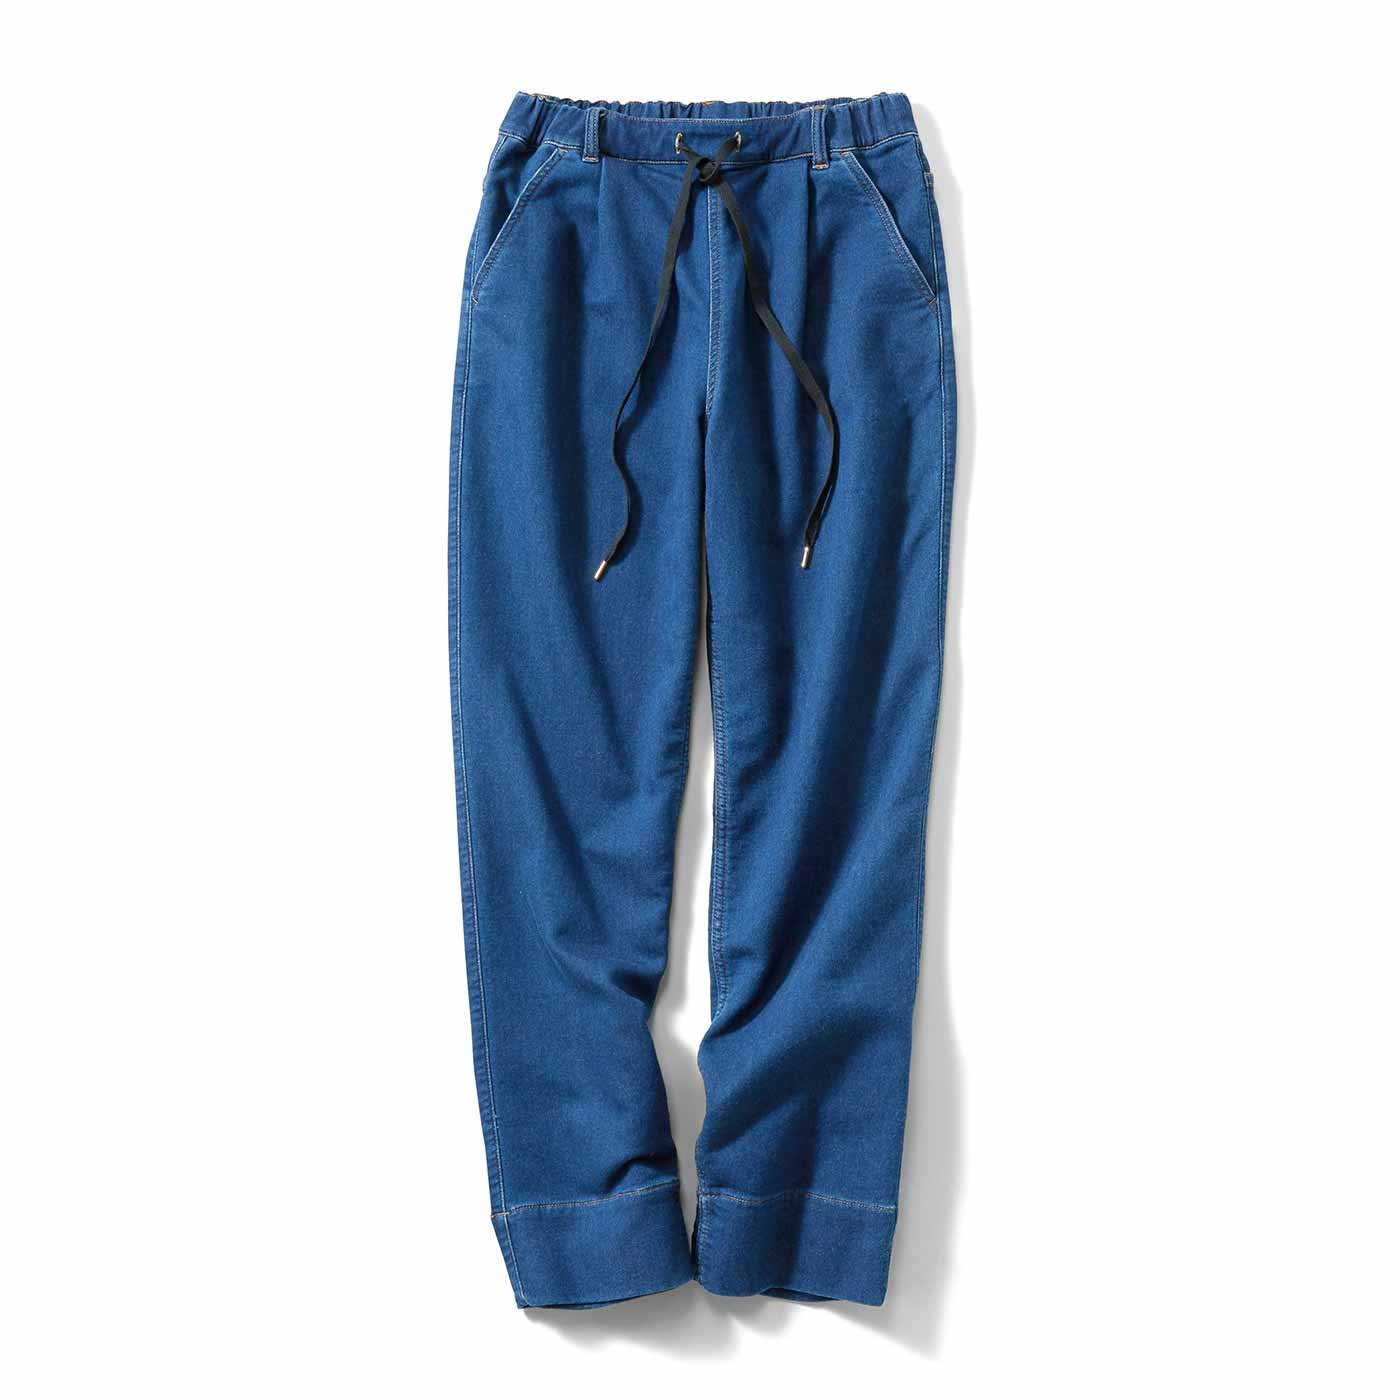 IEDIT[イディット] やわらかく伸びやかな 裏毛デニムタックパンツ〈ブルー〉